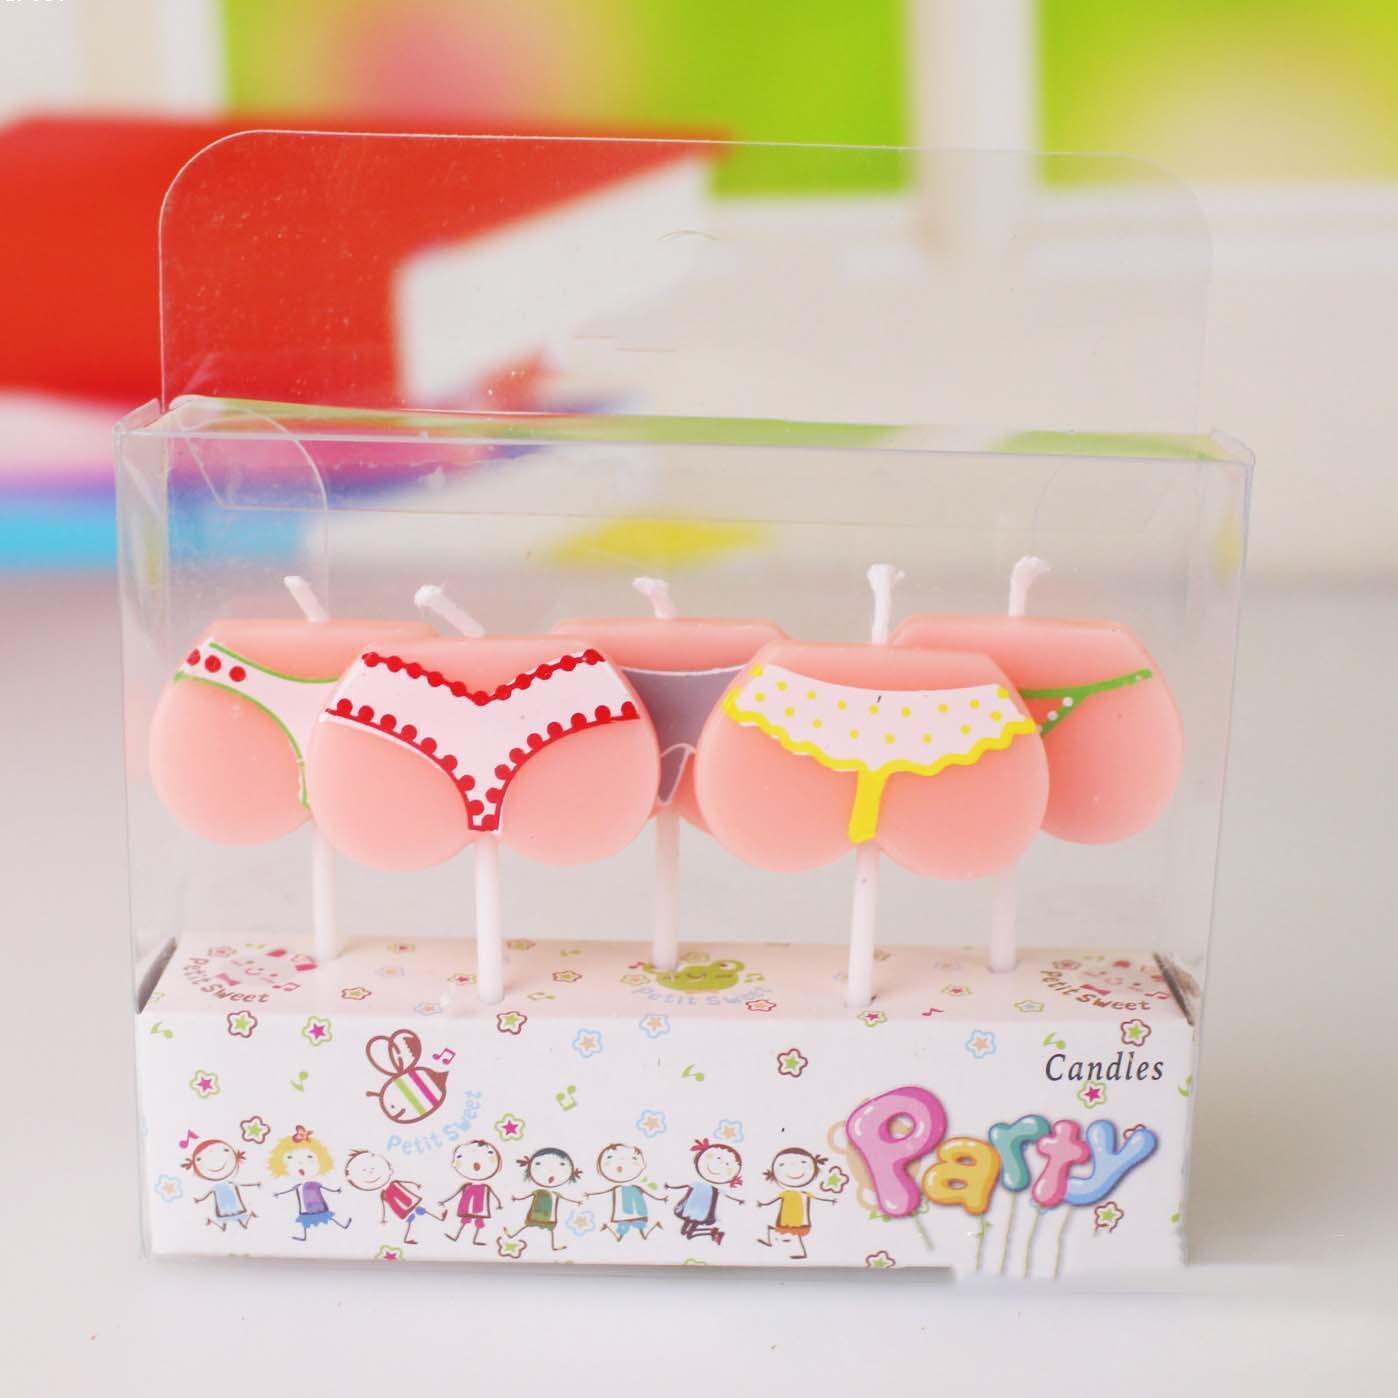 1 set Cartoon Candles for Birthday Cake stylish Ornament bikini Form ...